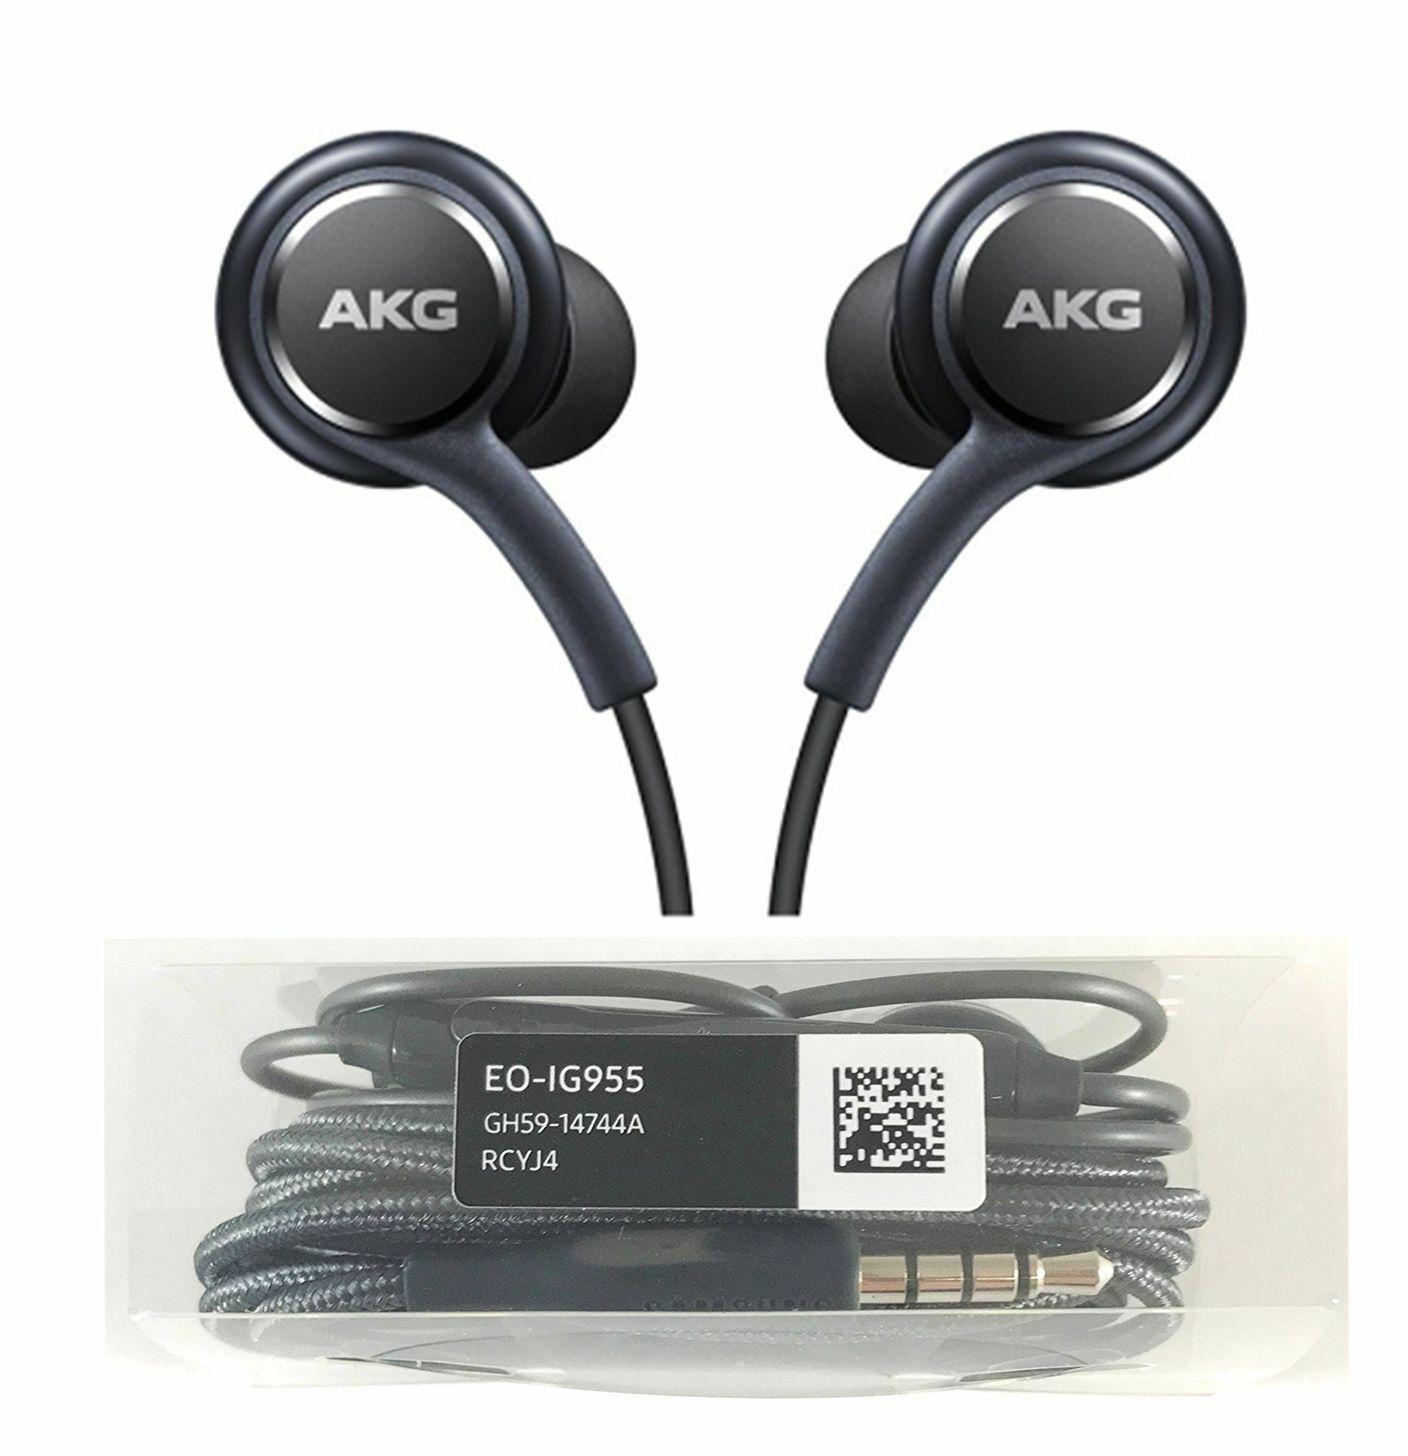 4a5f8826bbc Headphones Online: Best Prices in Pakistan - Daraz.pk